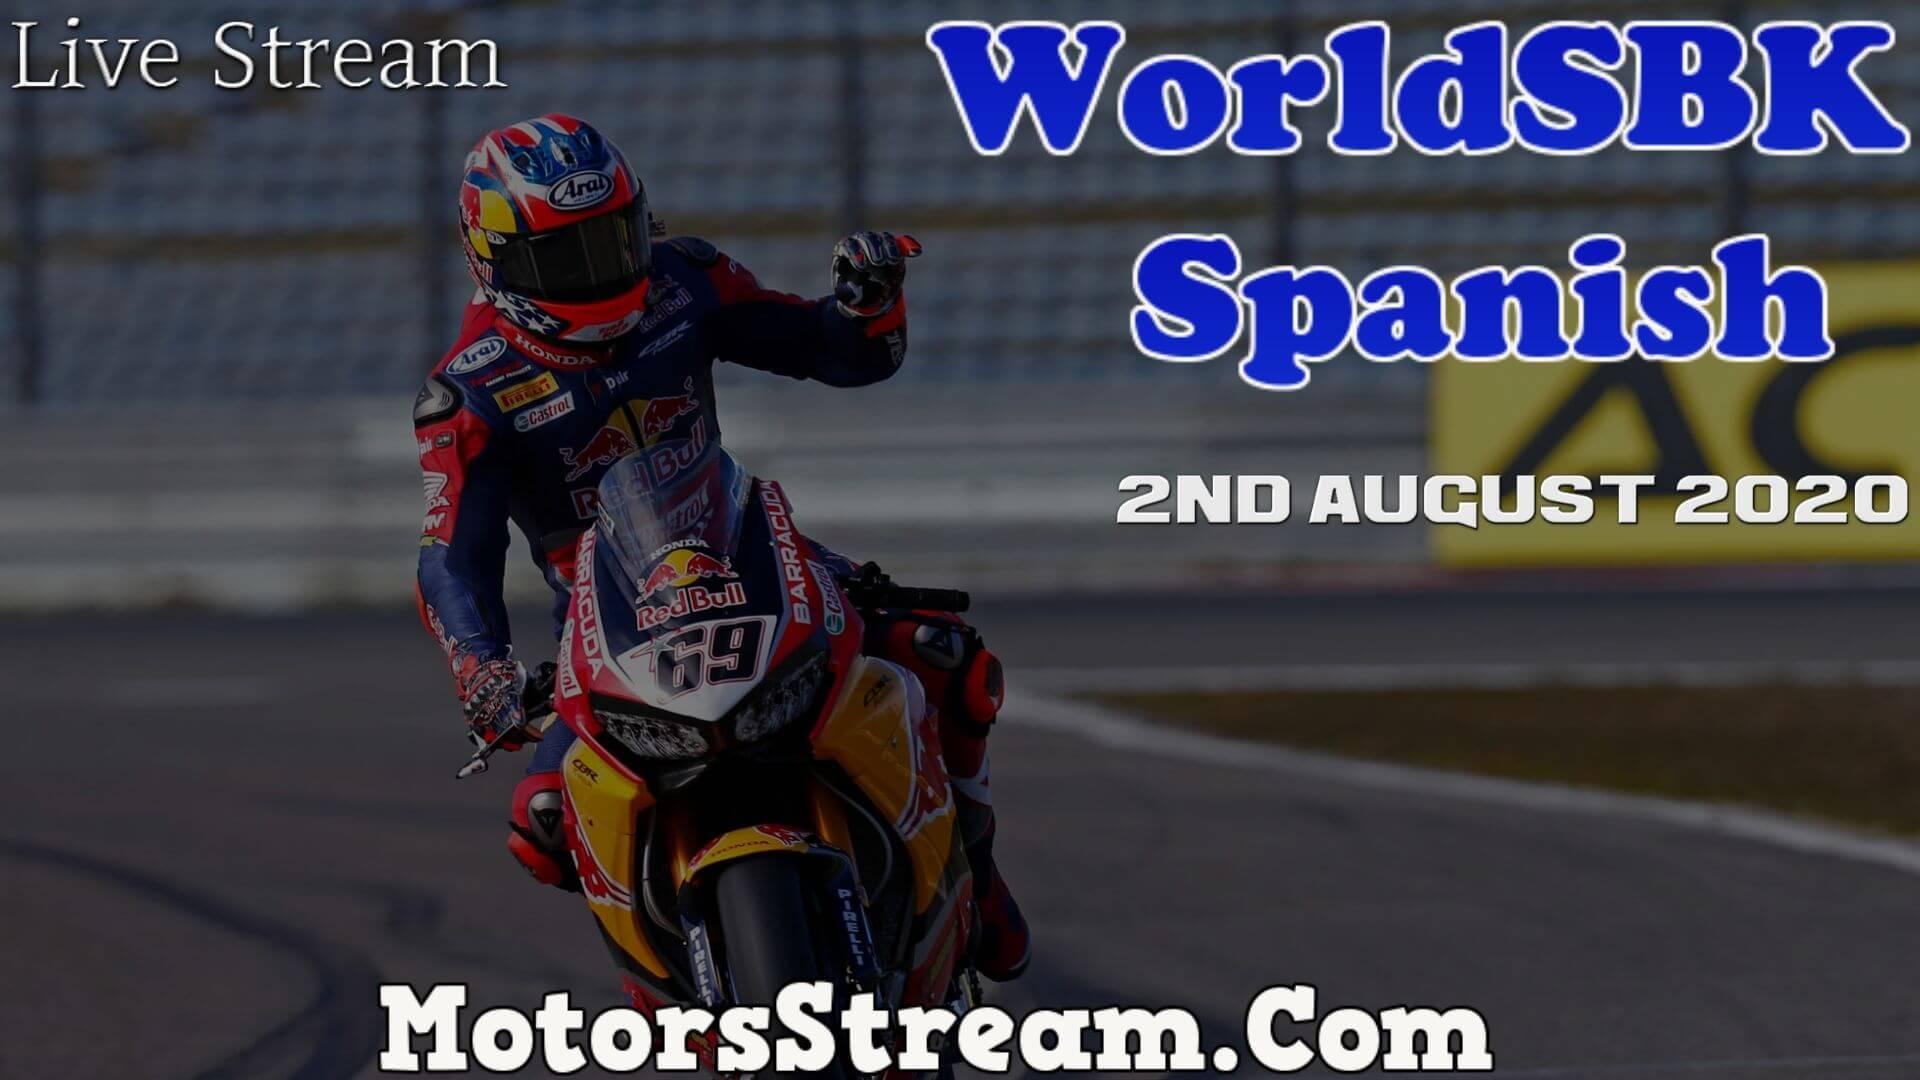 World Superbike Spain Live Online Full Race Replay